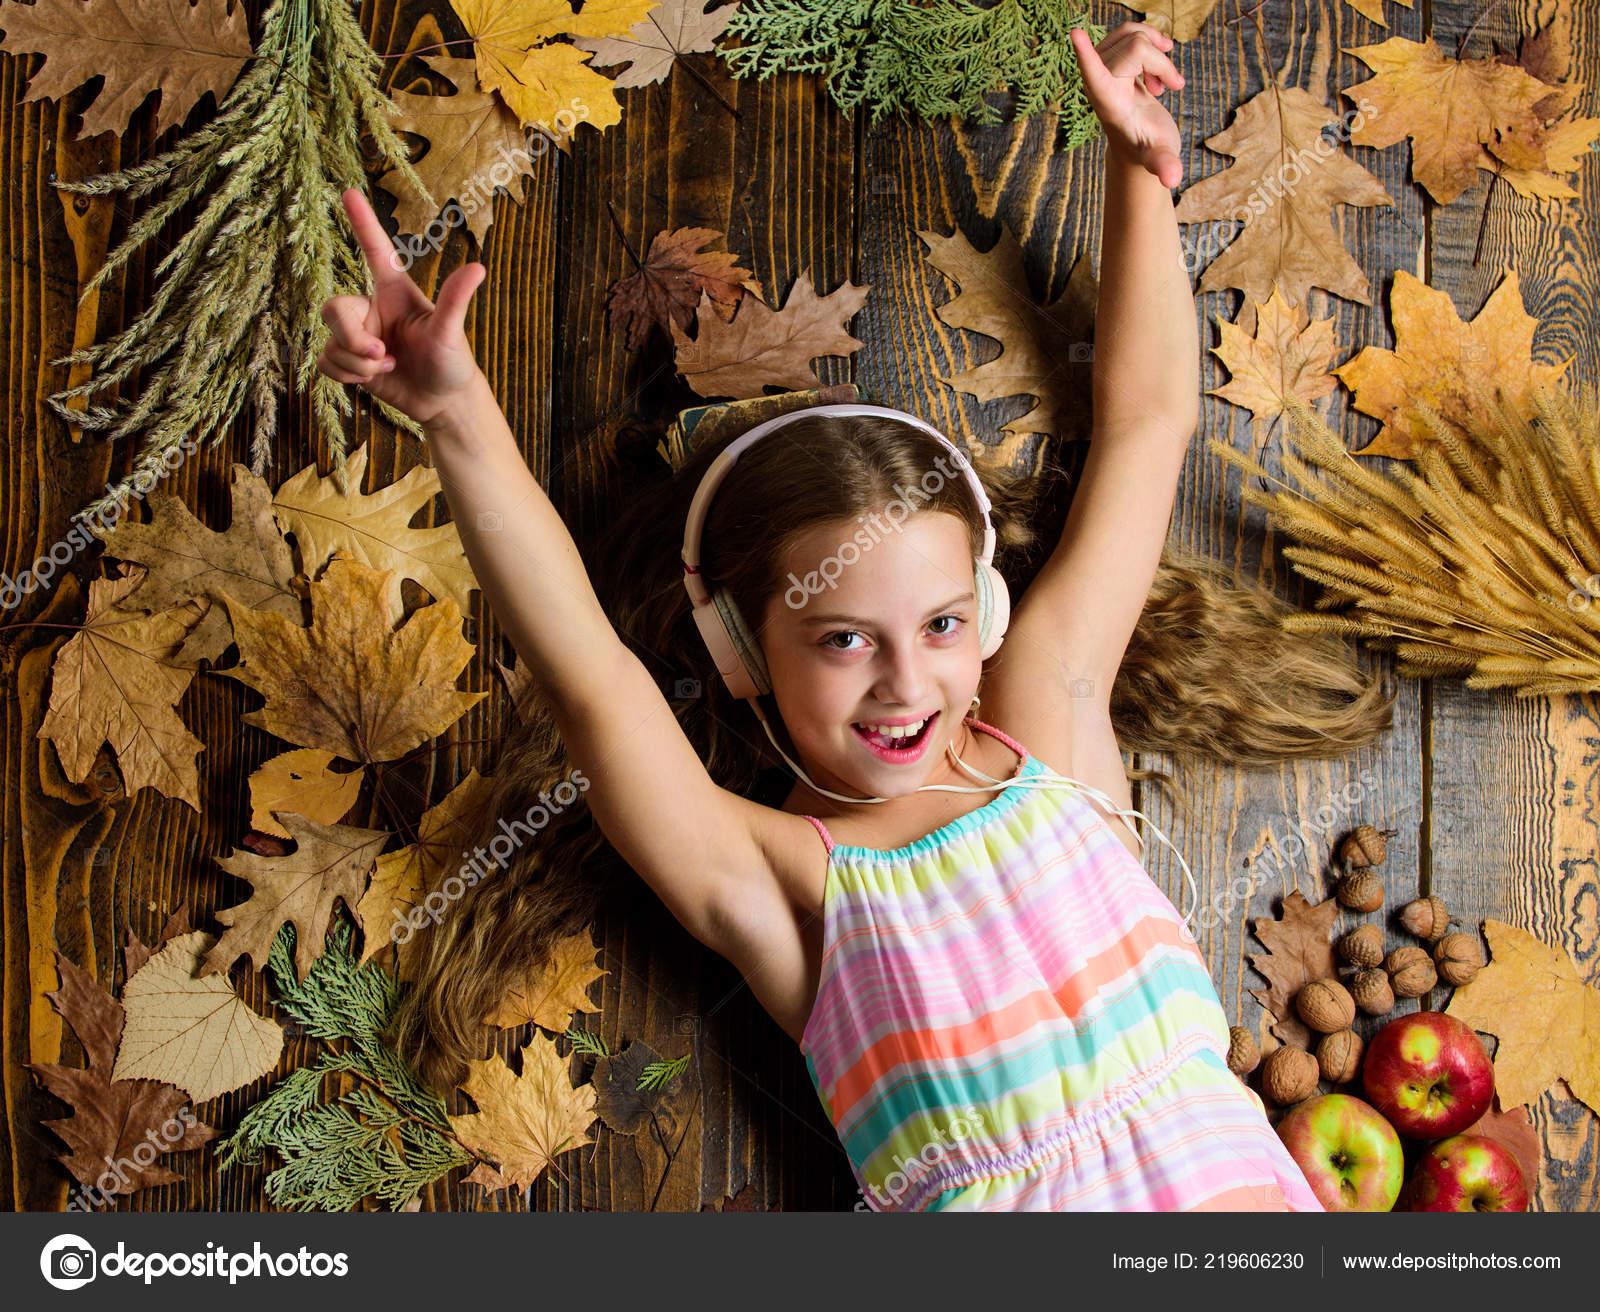 Kid girl wooden background listen music headphones child listen music relaxing top view autumn melody concept